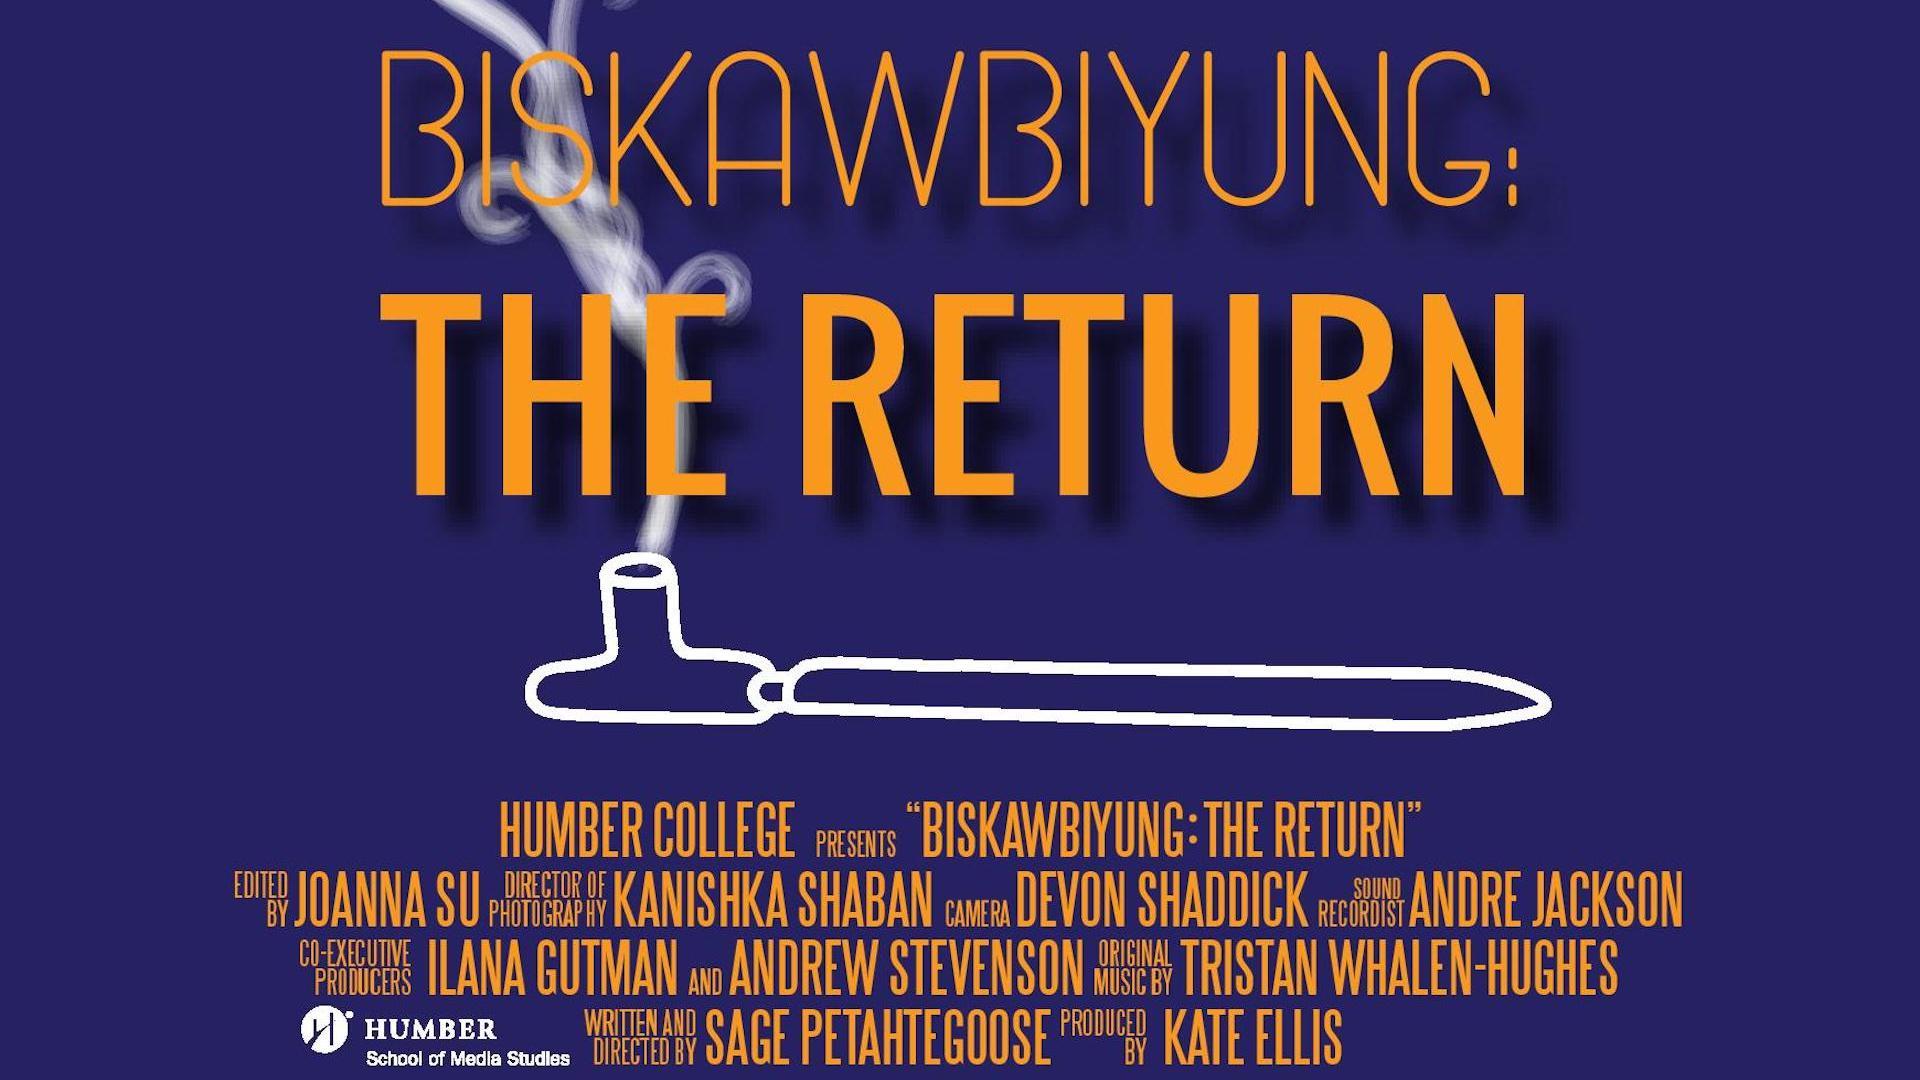 Biskawbiyung: The Return